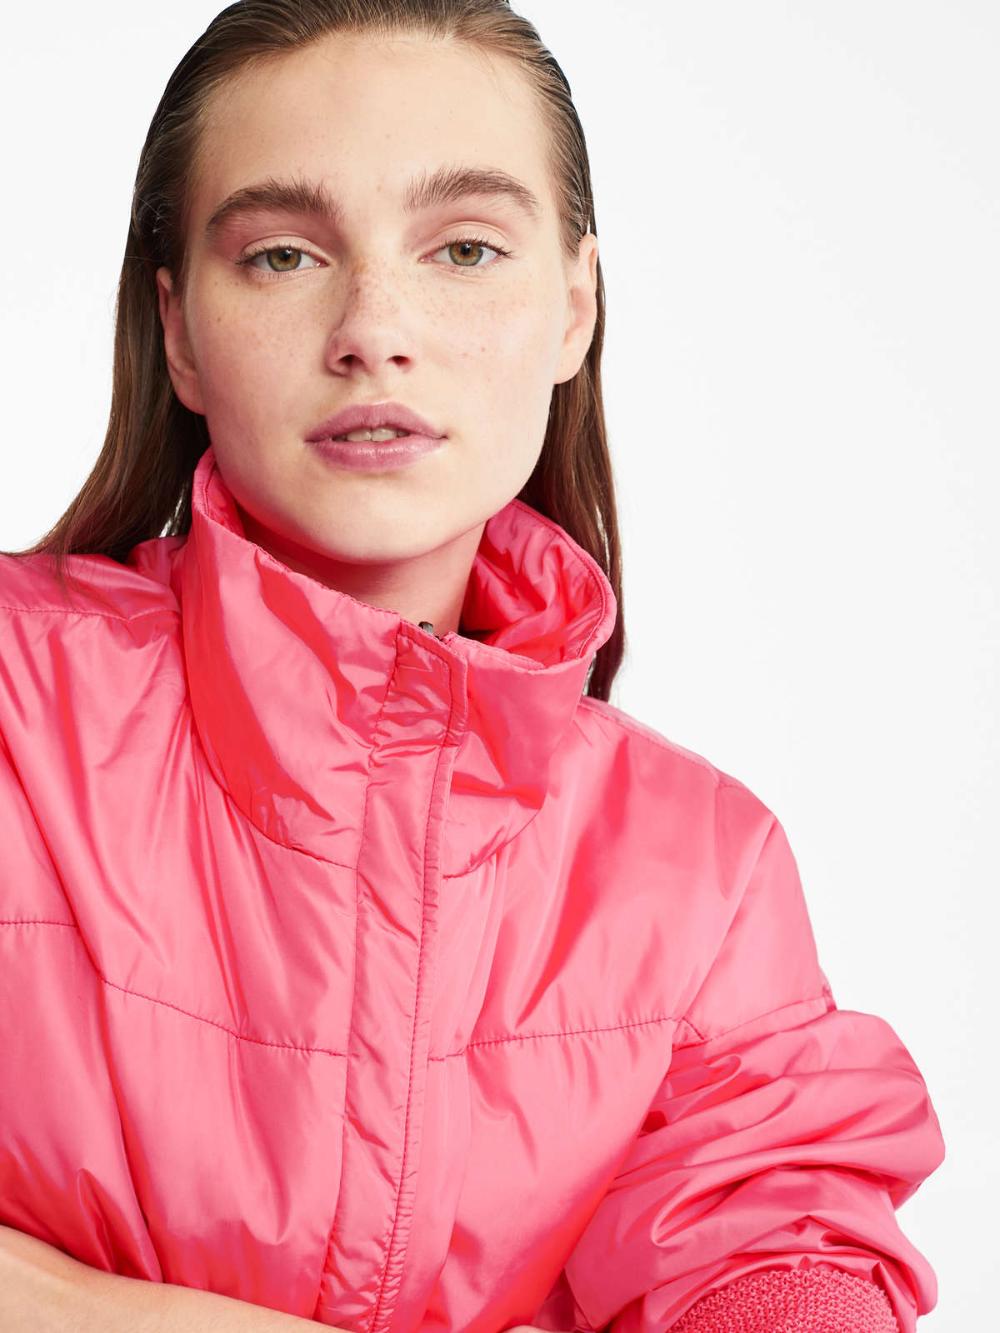 Max Mara – Water-repellent taffeta raincoat on lovethebrands.com and at Max Mara of course!